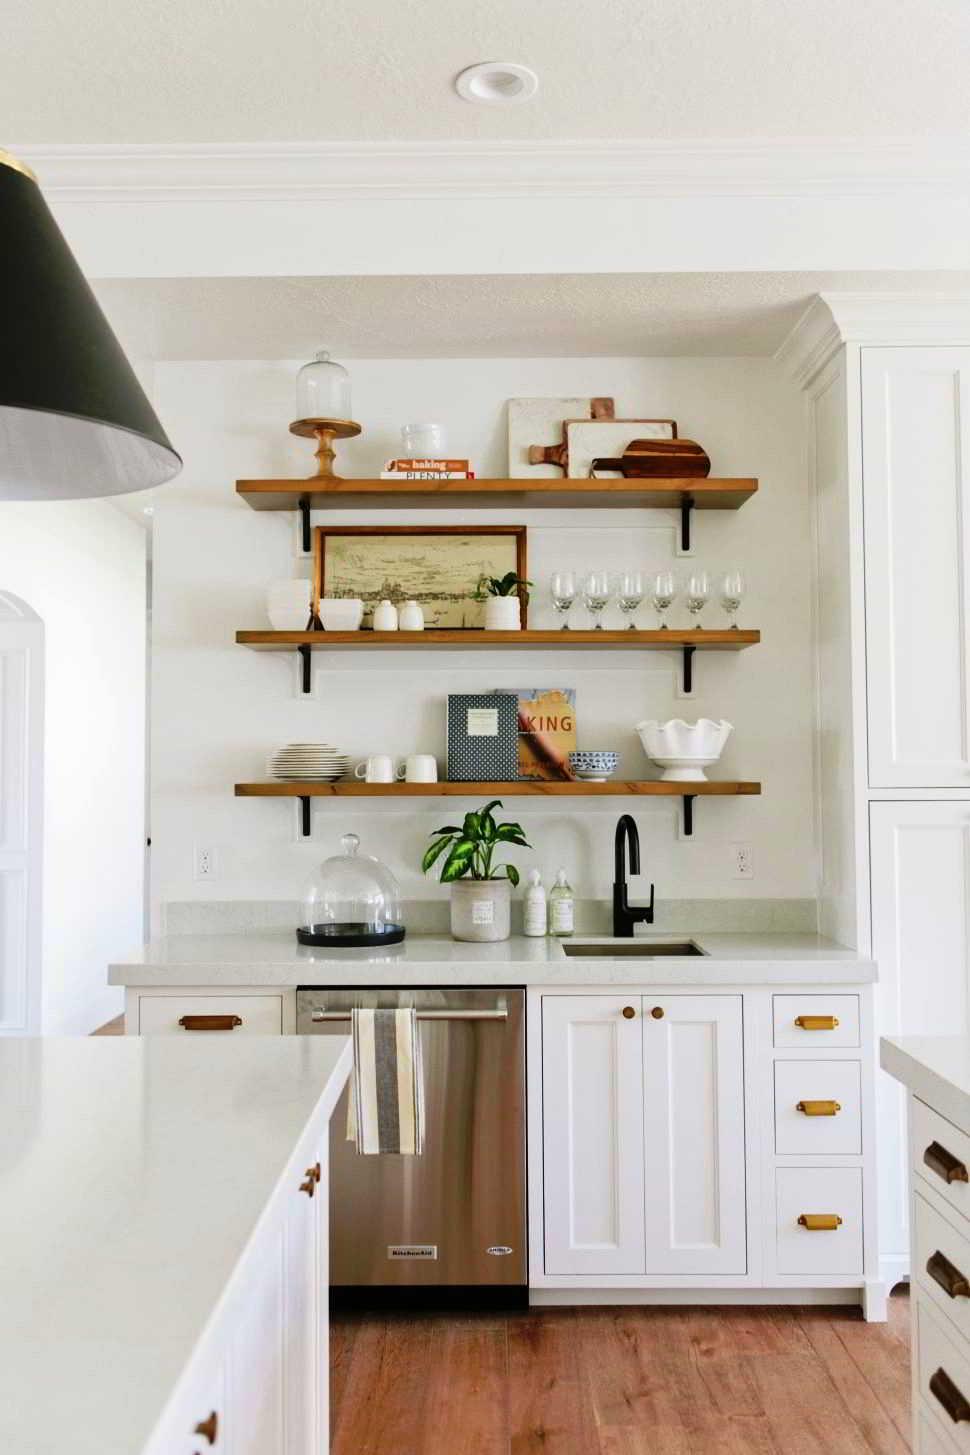 30+ desain dapur tanpa kitchen set & cara menatanya